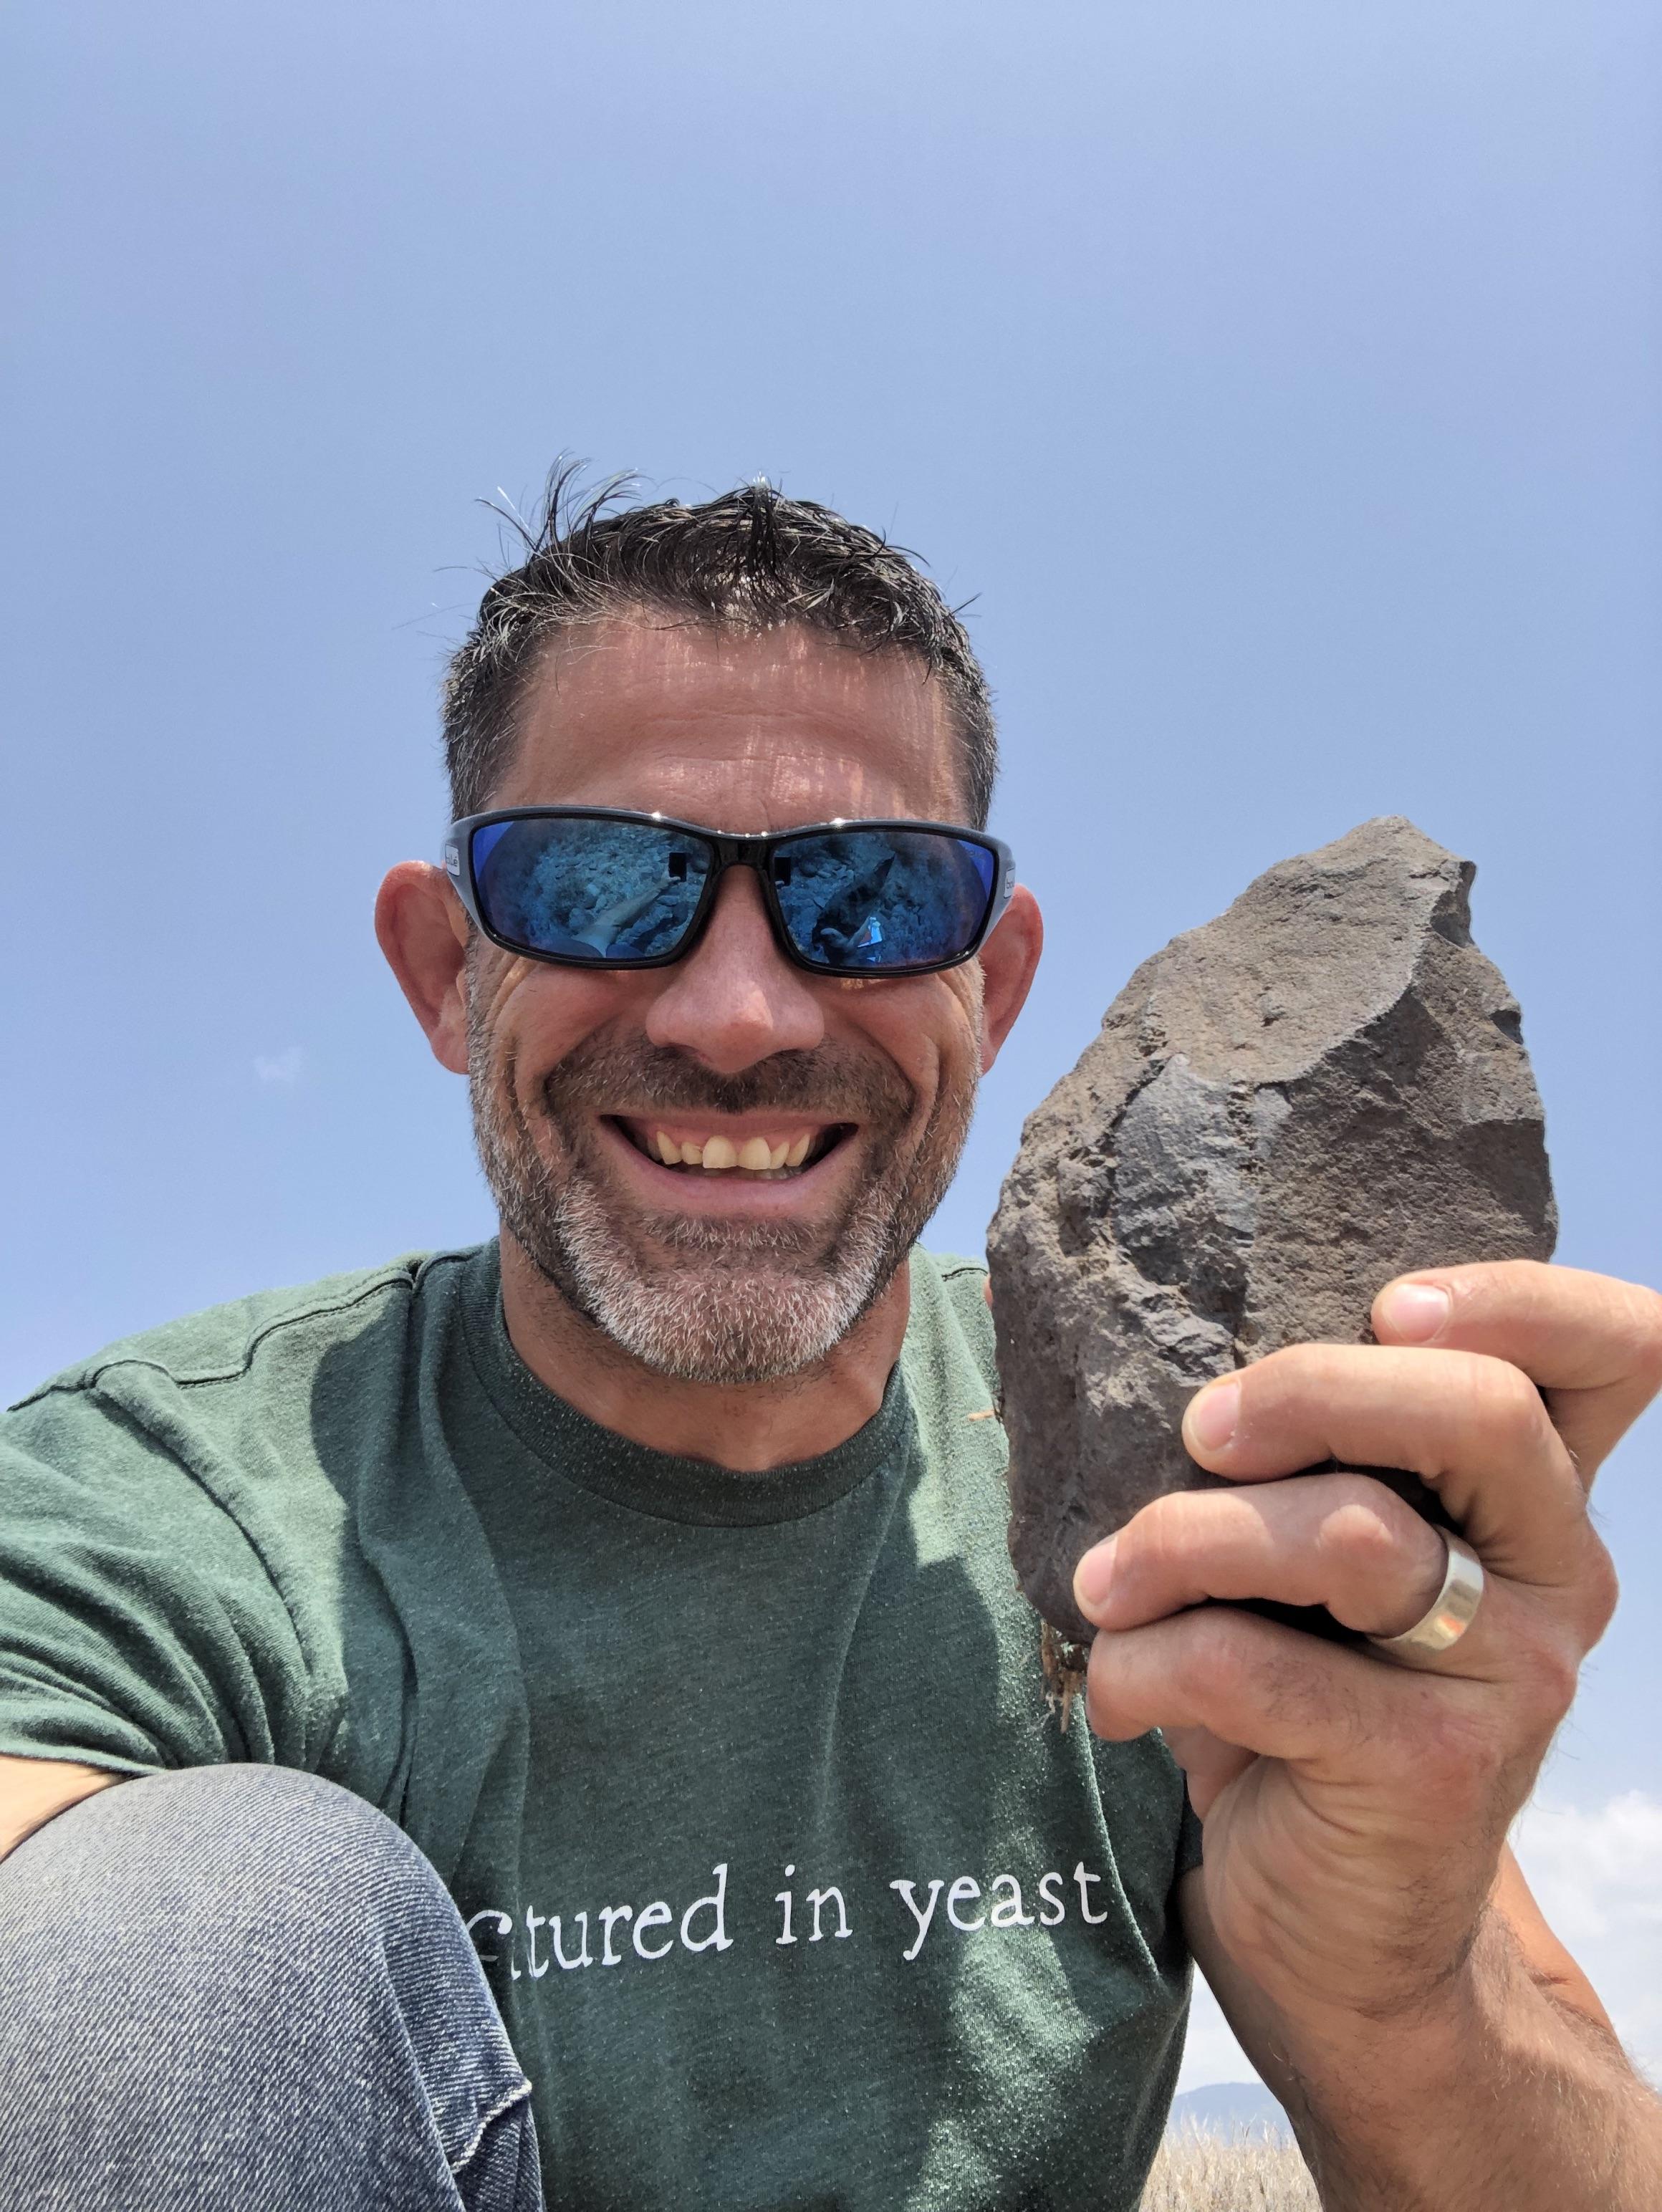 One happy archaeologist!